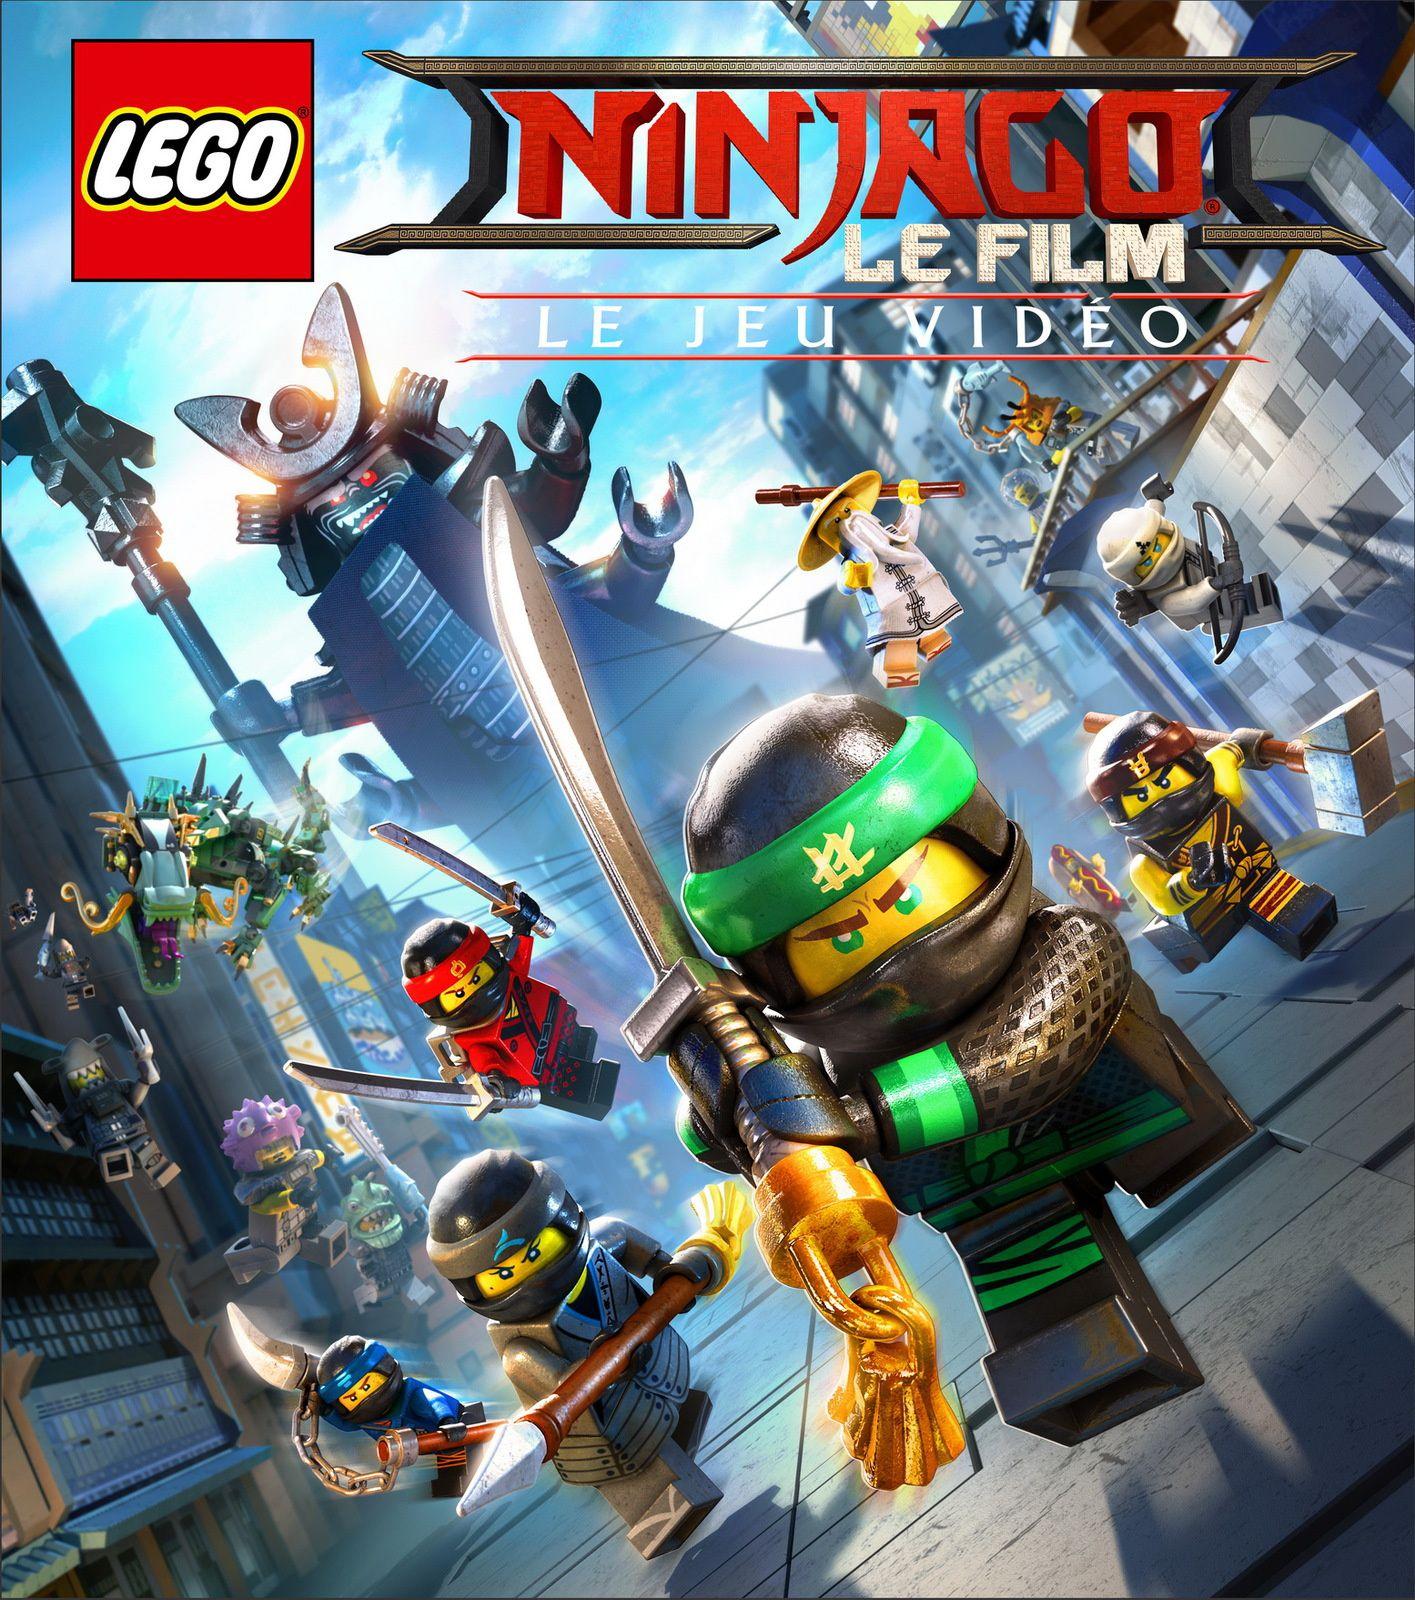 TEST de LEGO NINJAGO LE FILM - Le jeu vidéo (sur PS4): konnichiwa jeune ninja